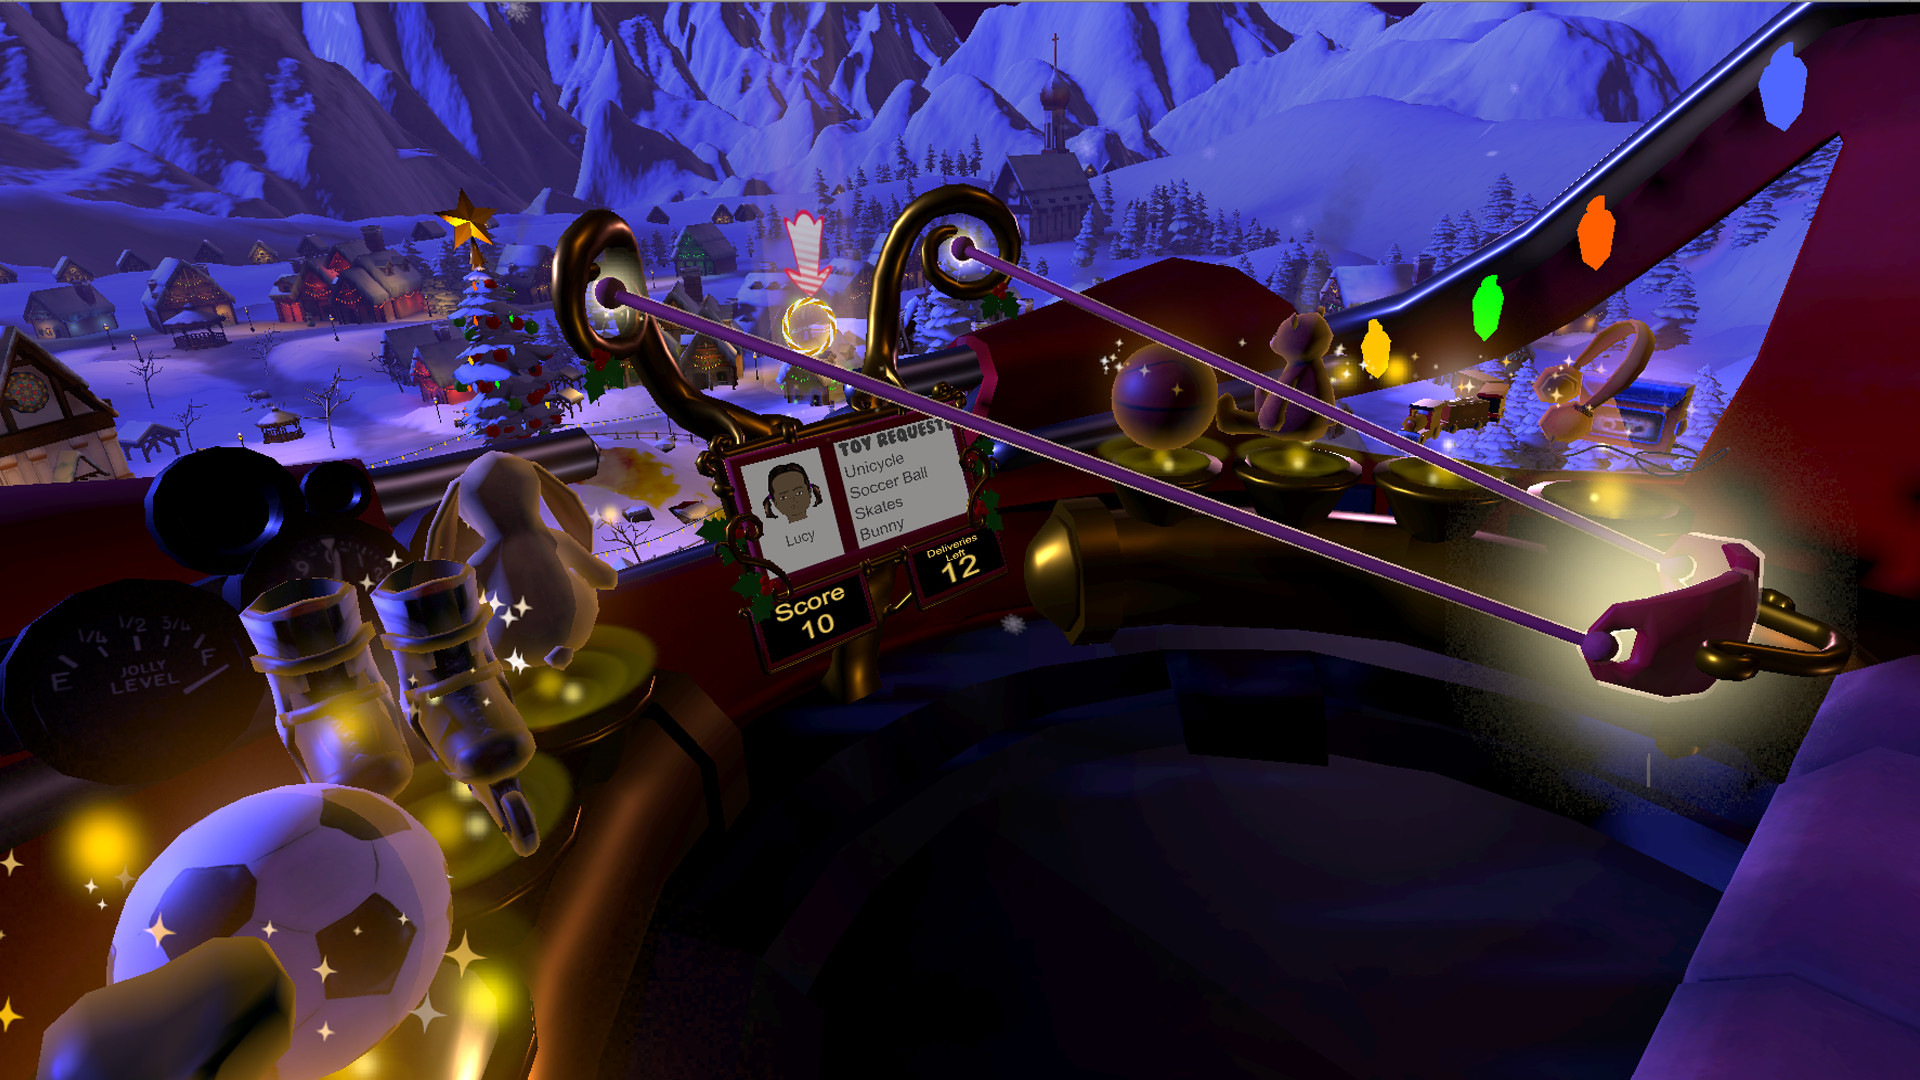 Santa Sling VR